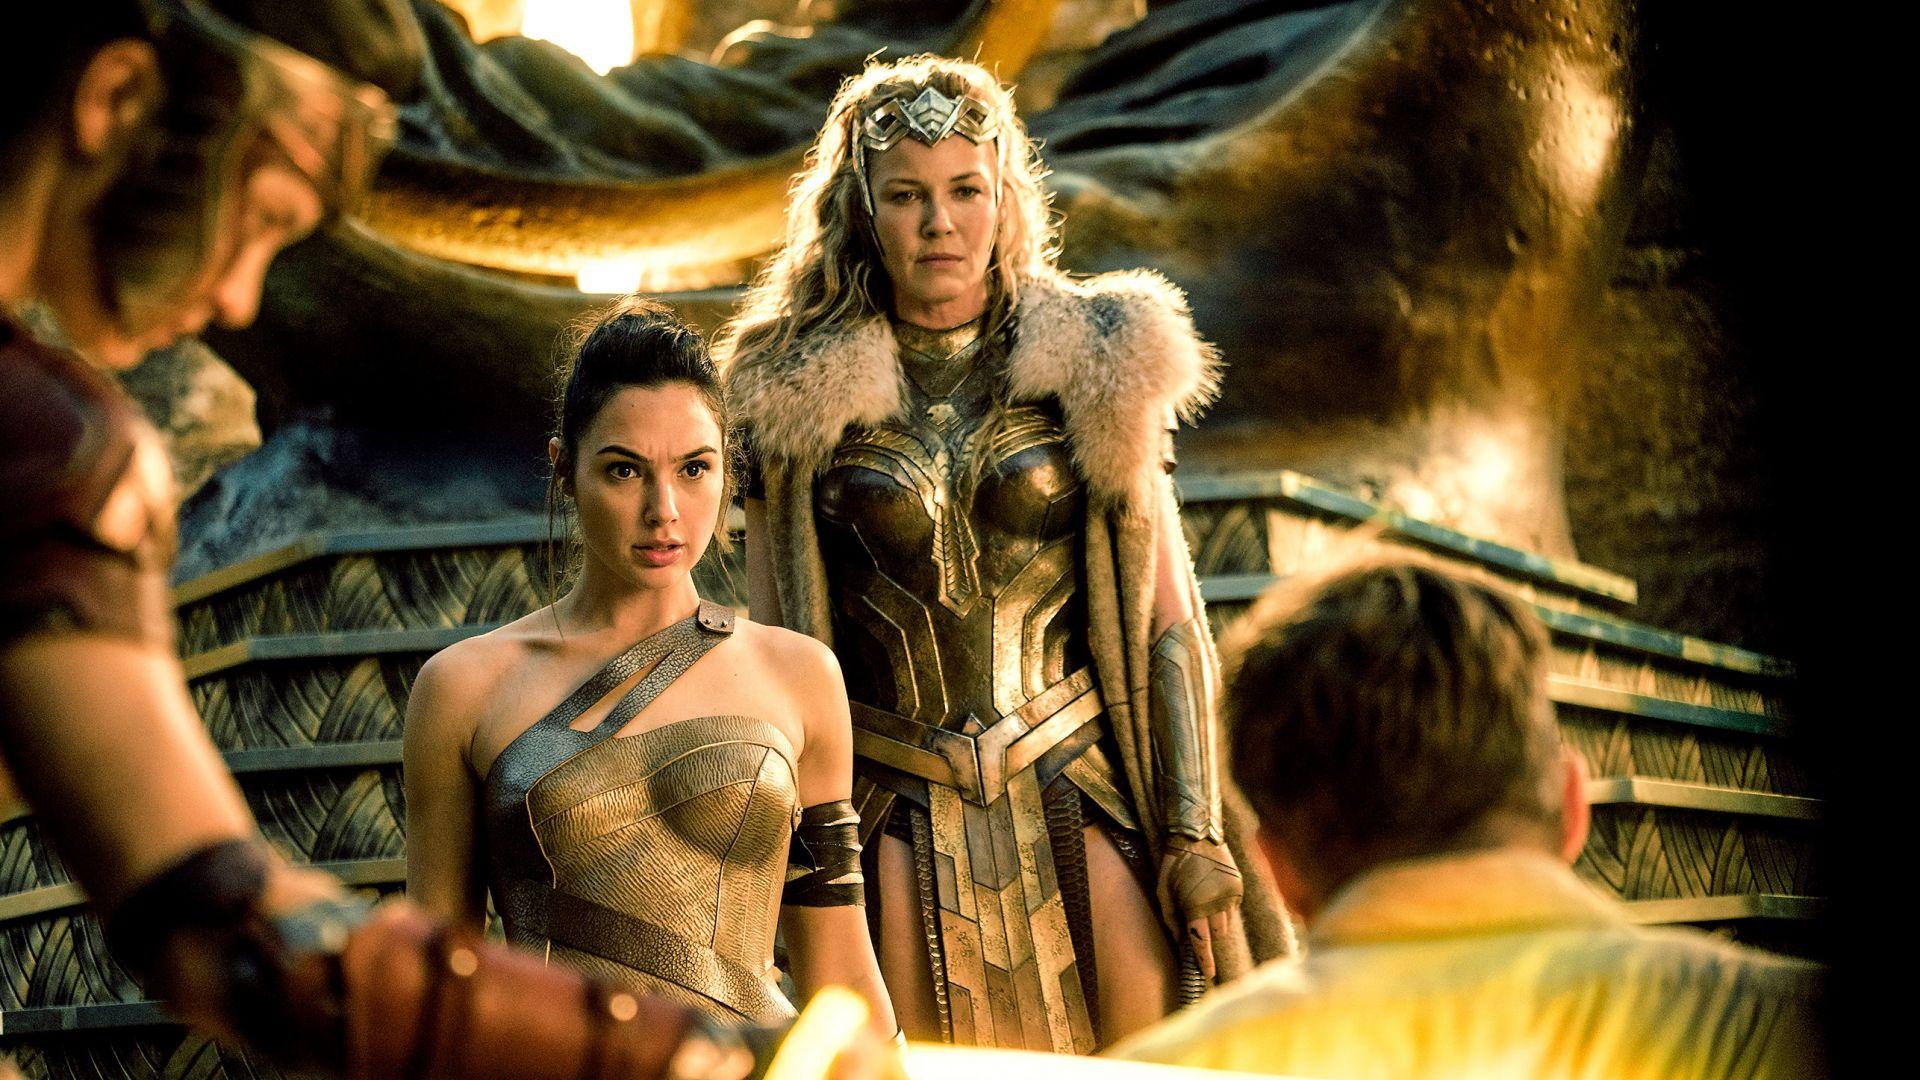 Wallpaper Wonder woman, Connie Nielsen, Gal Gadot, movie